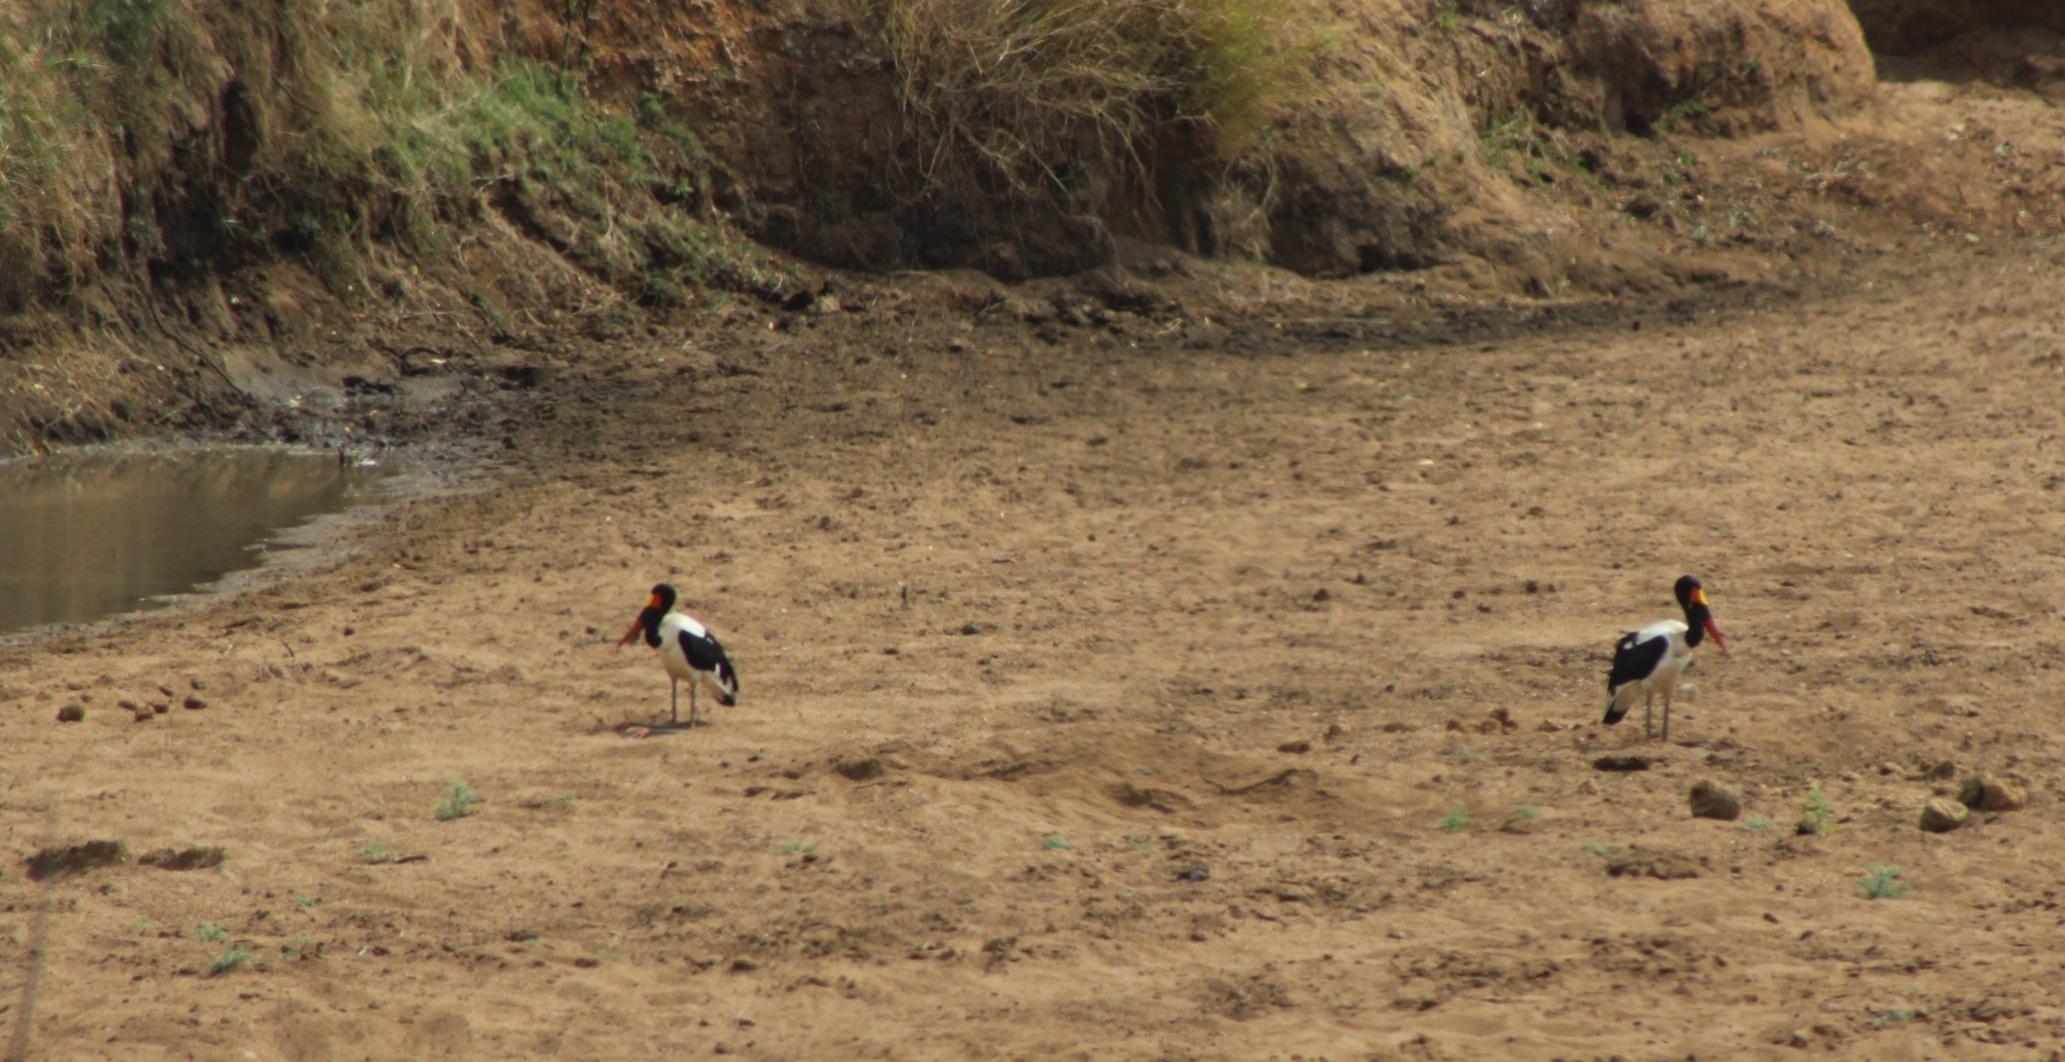 iSimangaliso also holds breeding Goliath Heron Ardea goliath (right, Photo Credit: Neil Aldridge/WildScreenExchange) and the only breeding population of Saddle-billed Stork Ephippiorhynchus senegalensis (above, Photo Credit: Tori Gray) in KwaZulu-Natal.